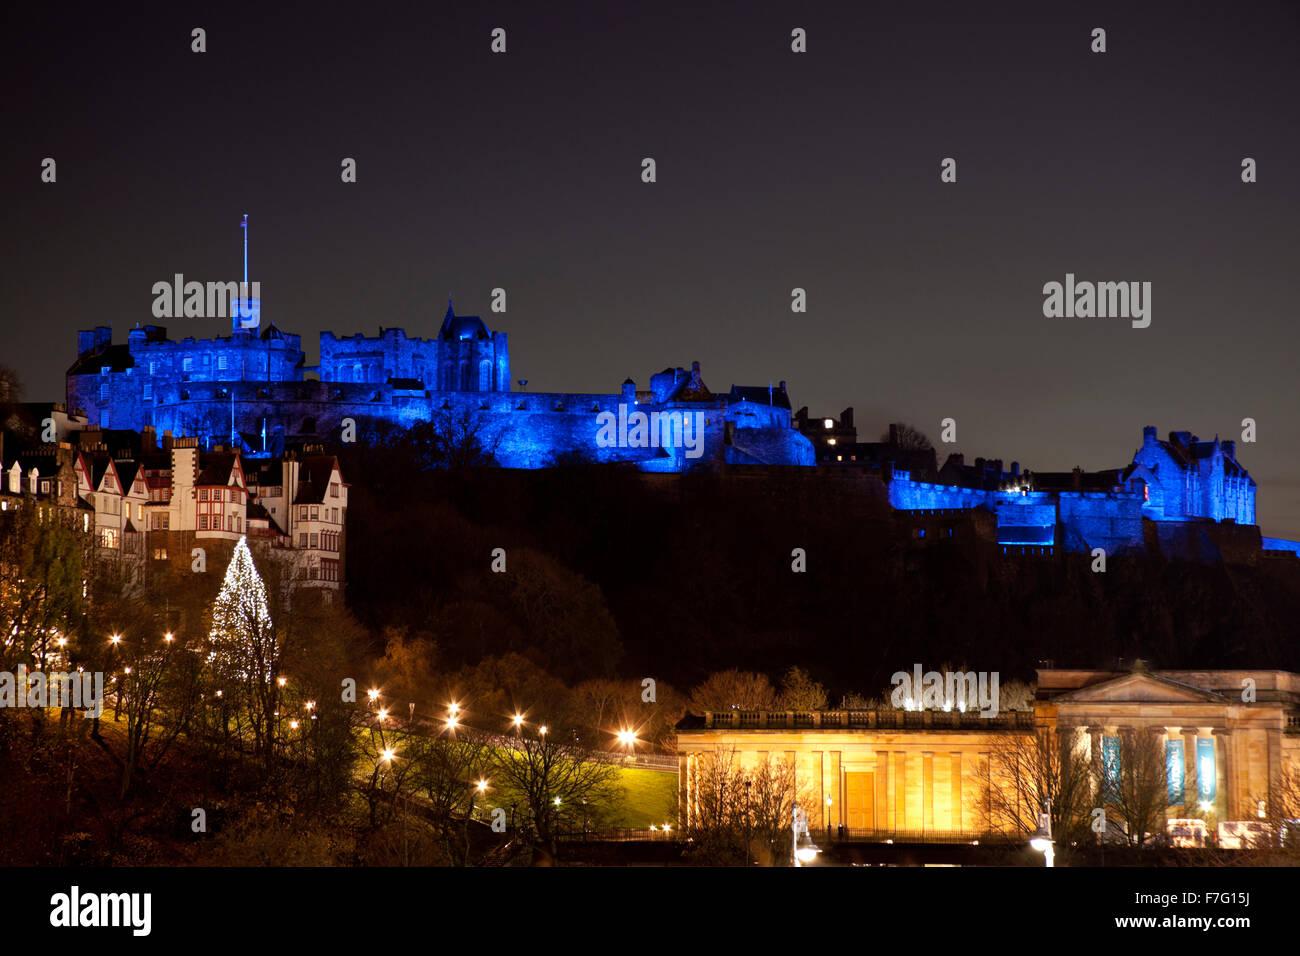 Edinburgh, Scotland, UK. 30 Nov, 2015. to celebrate St Andrews night  the Scottish capital's buidings including - Stock Image